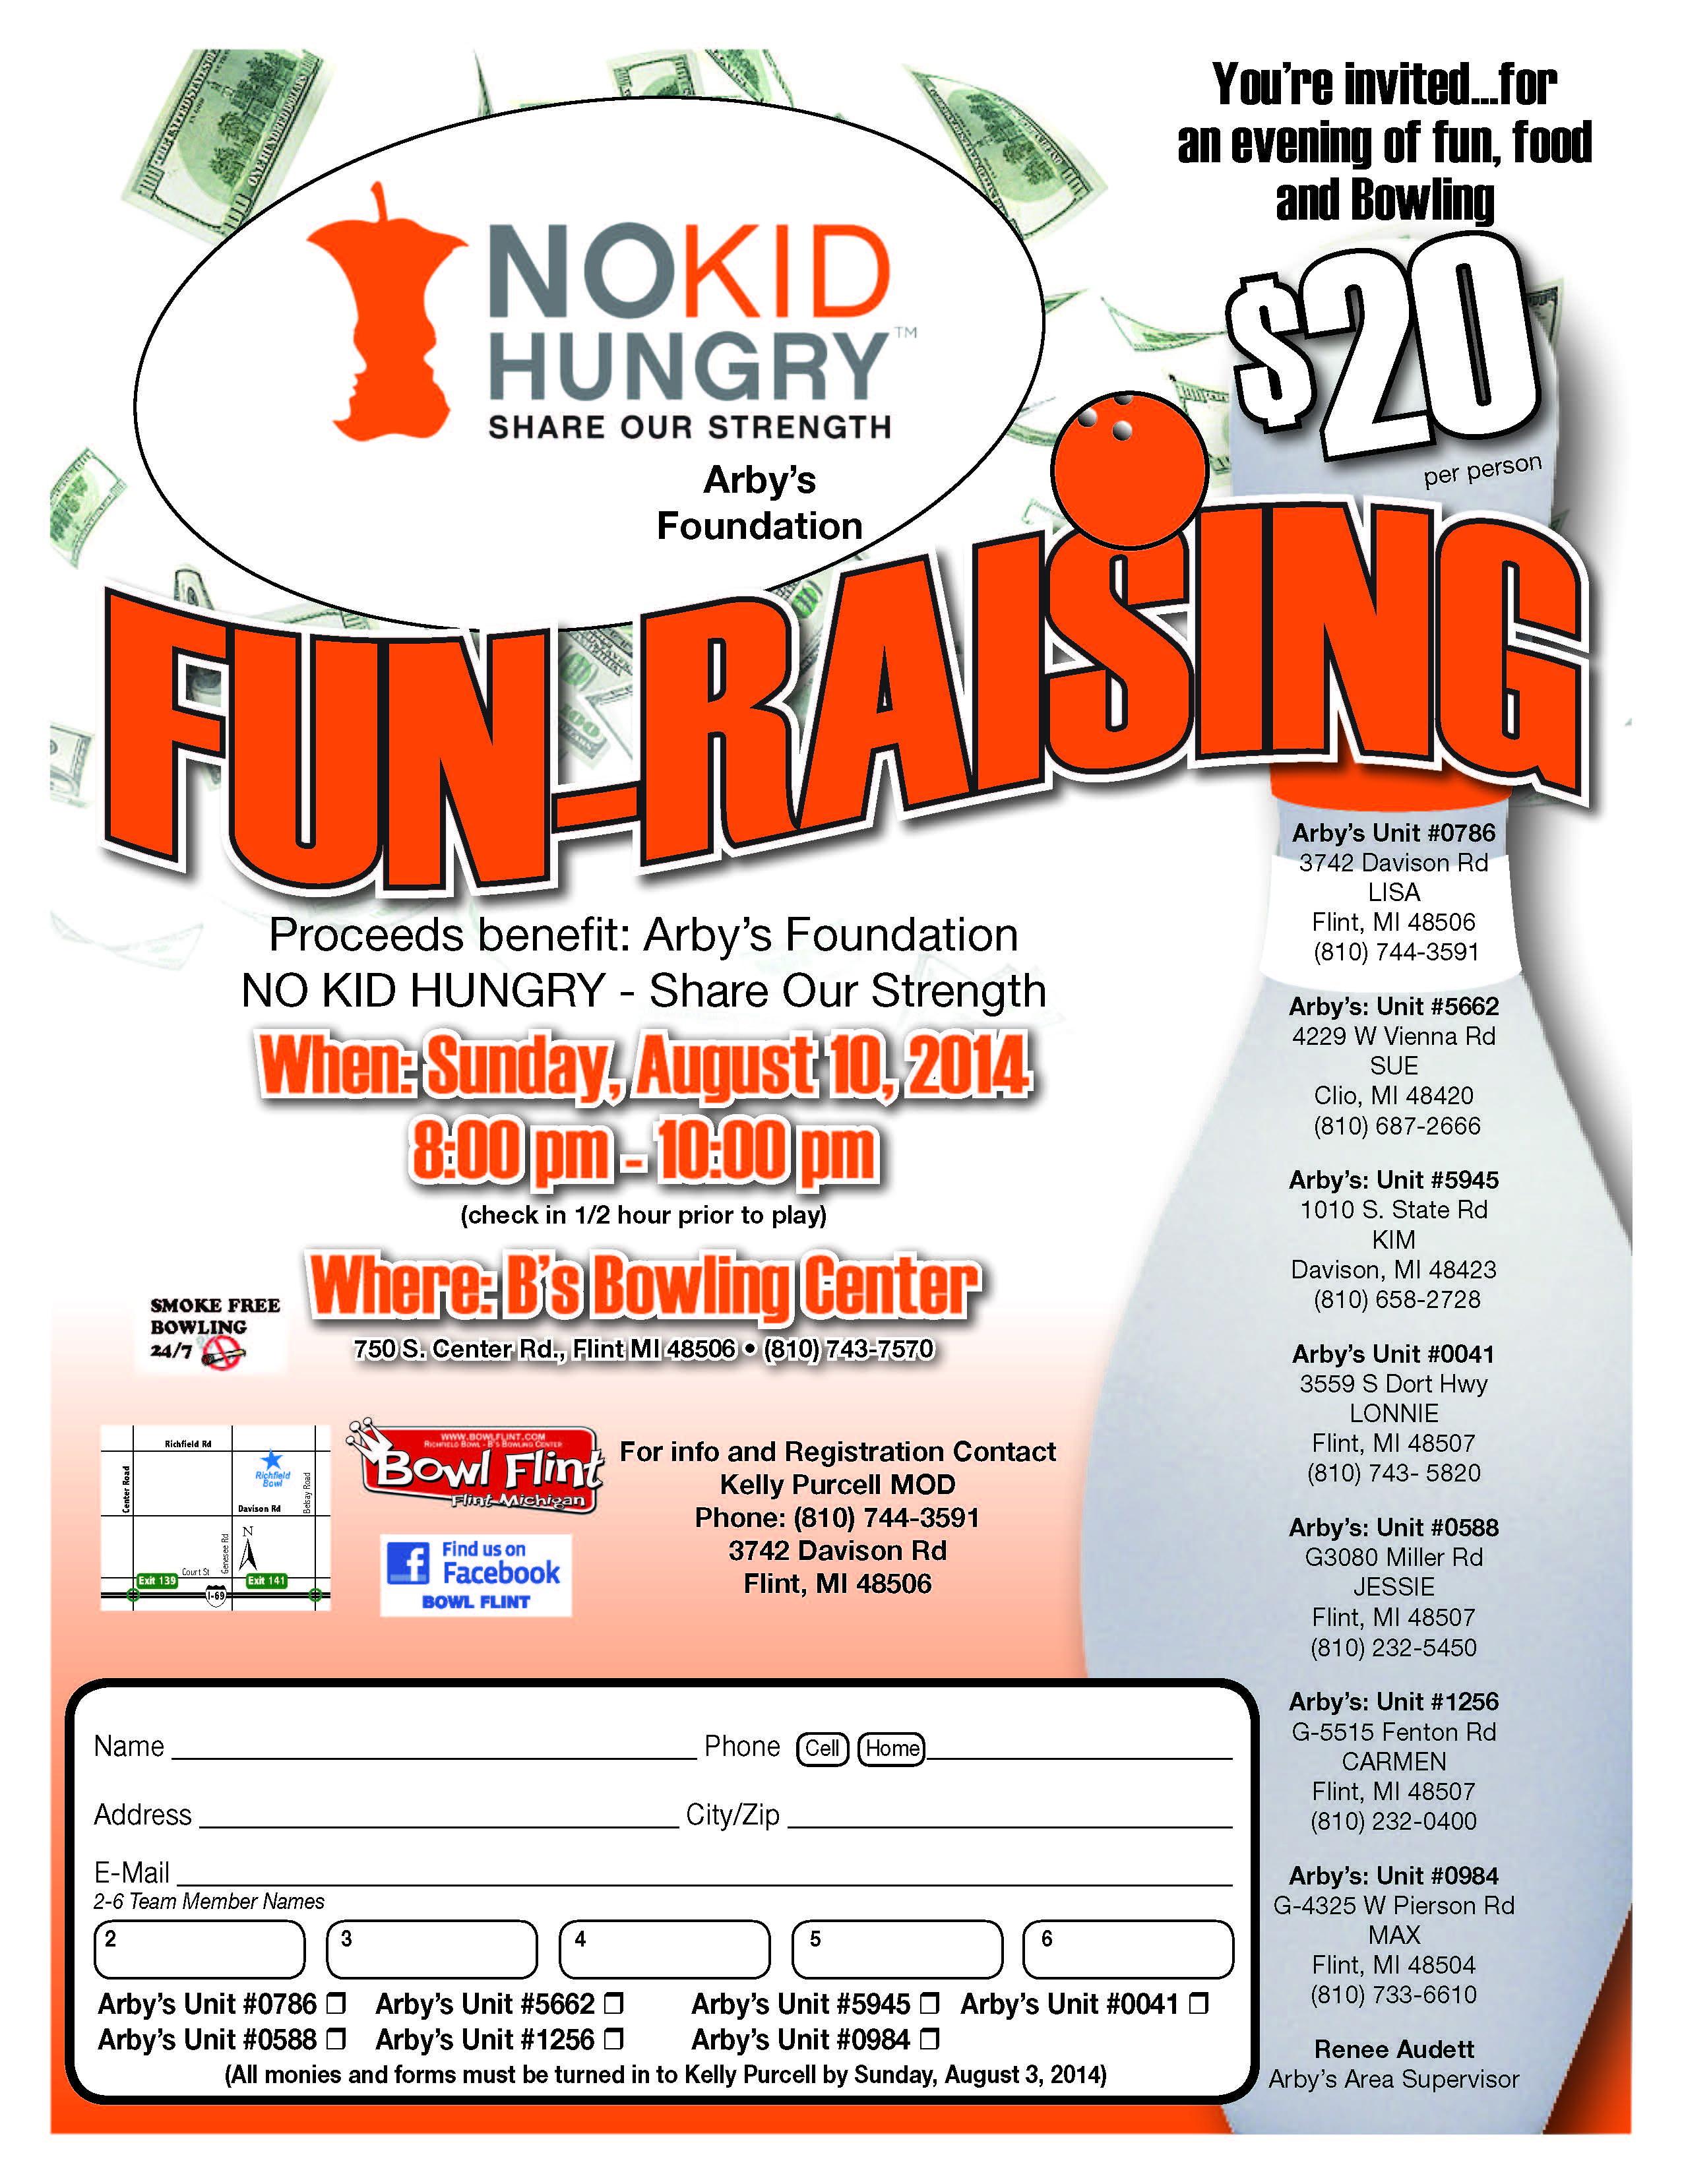 Free Printable Fundraiser Flyer Templates - Templates #20454 - Free Printable Fundraiser Flyer Templates